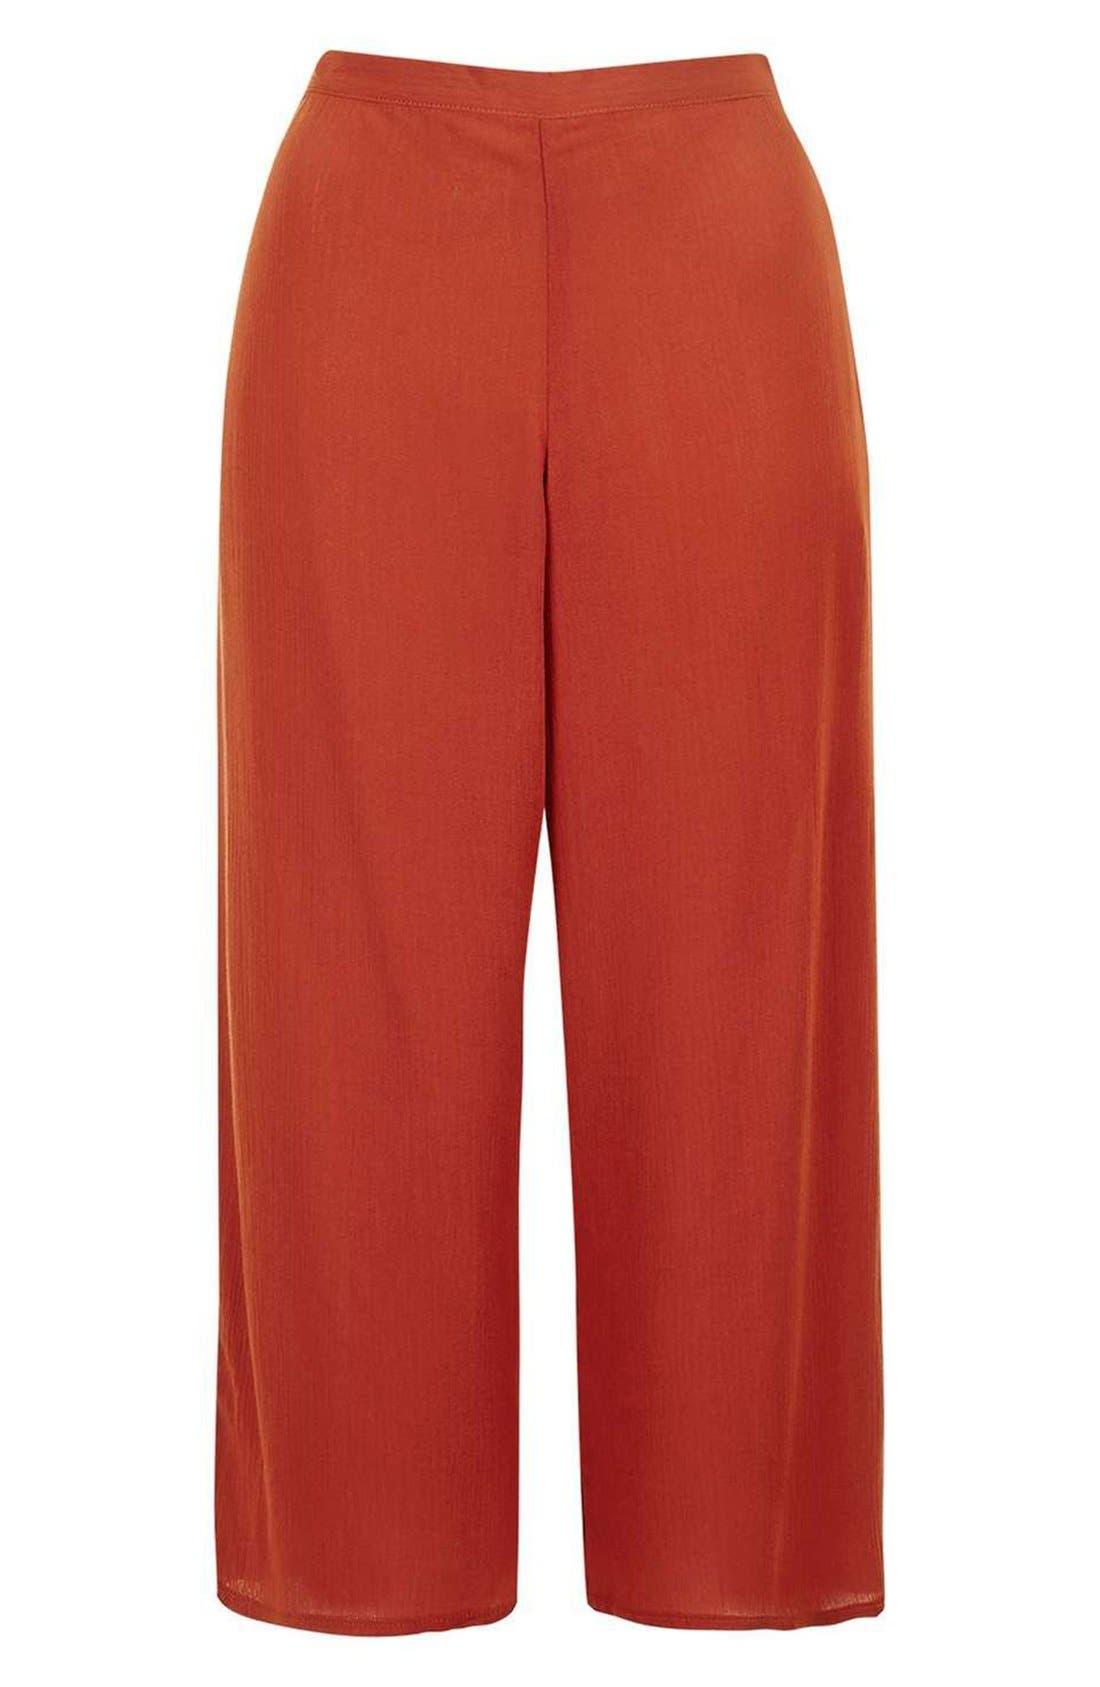 Alternate Image 4  - Topshop Crinkled Crop Wide Leg Trousers